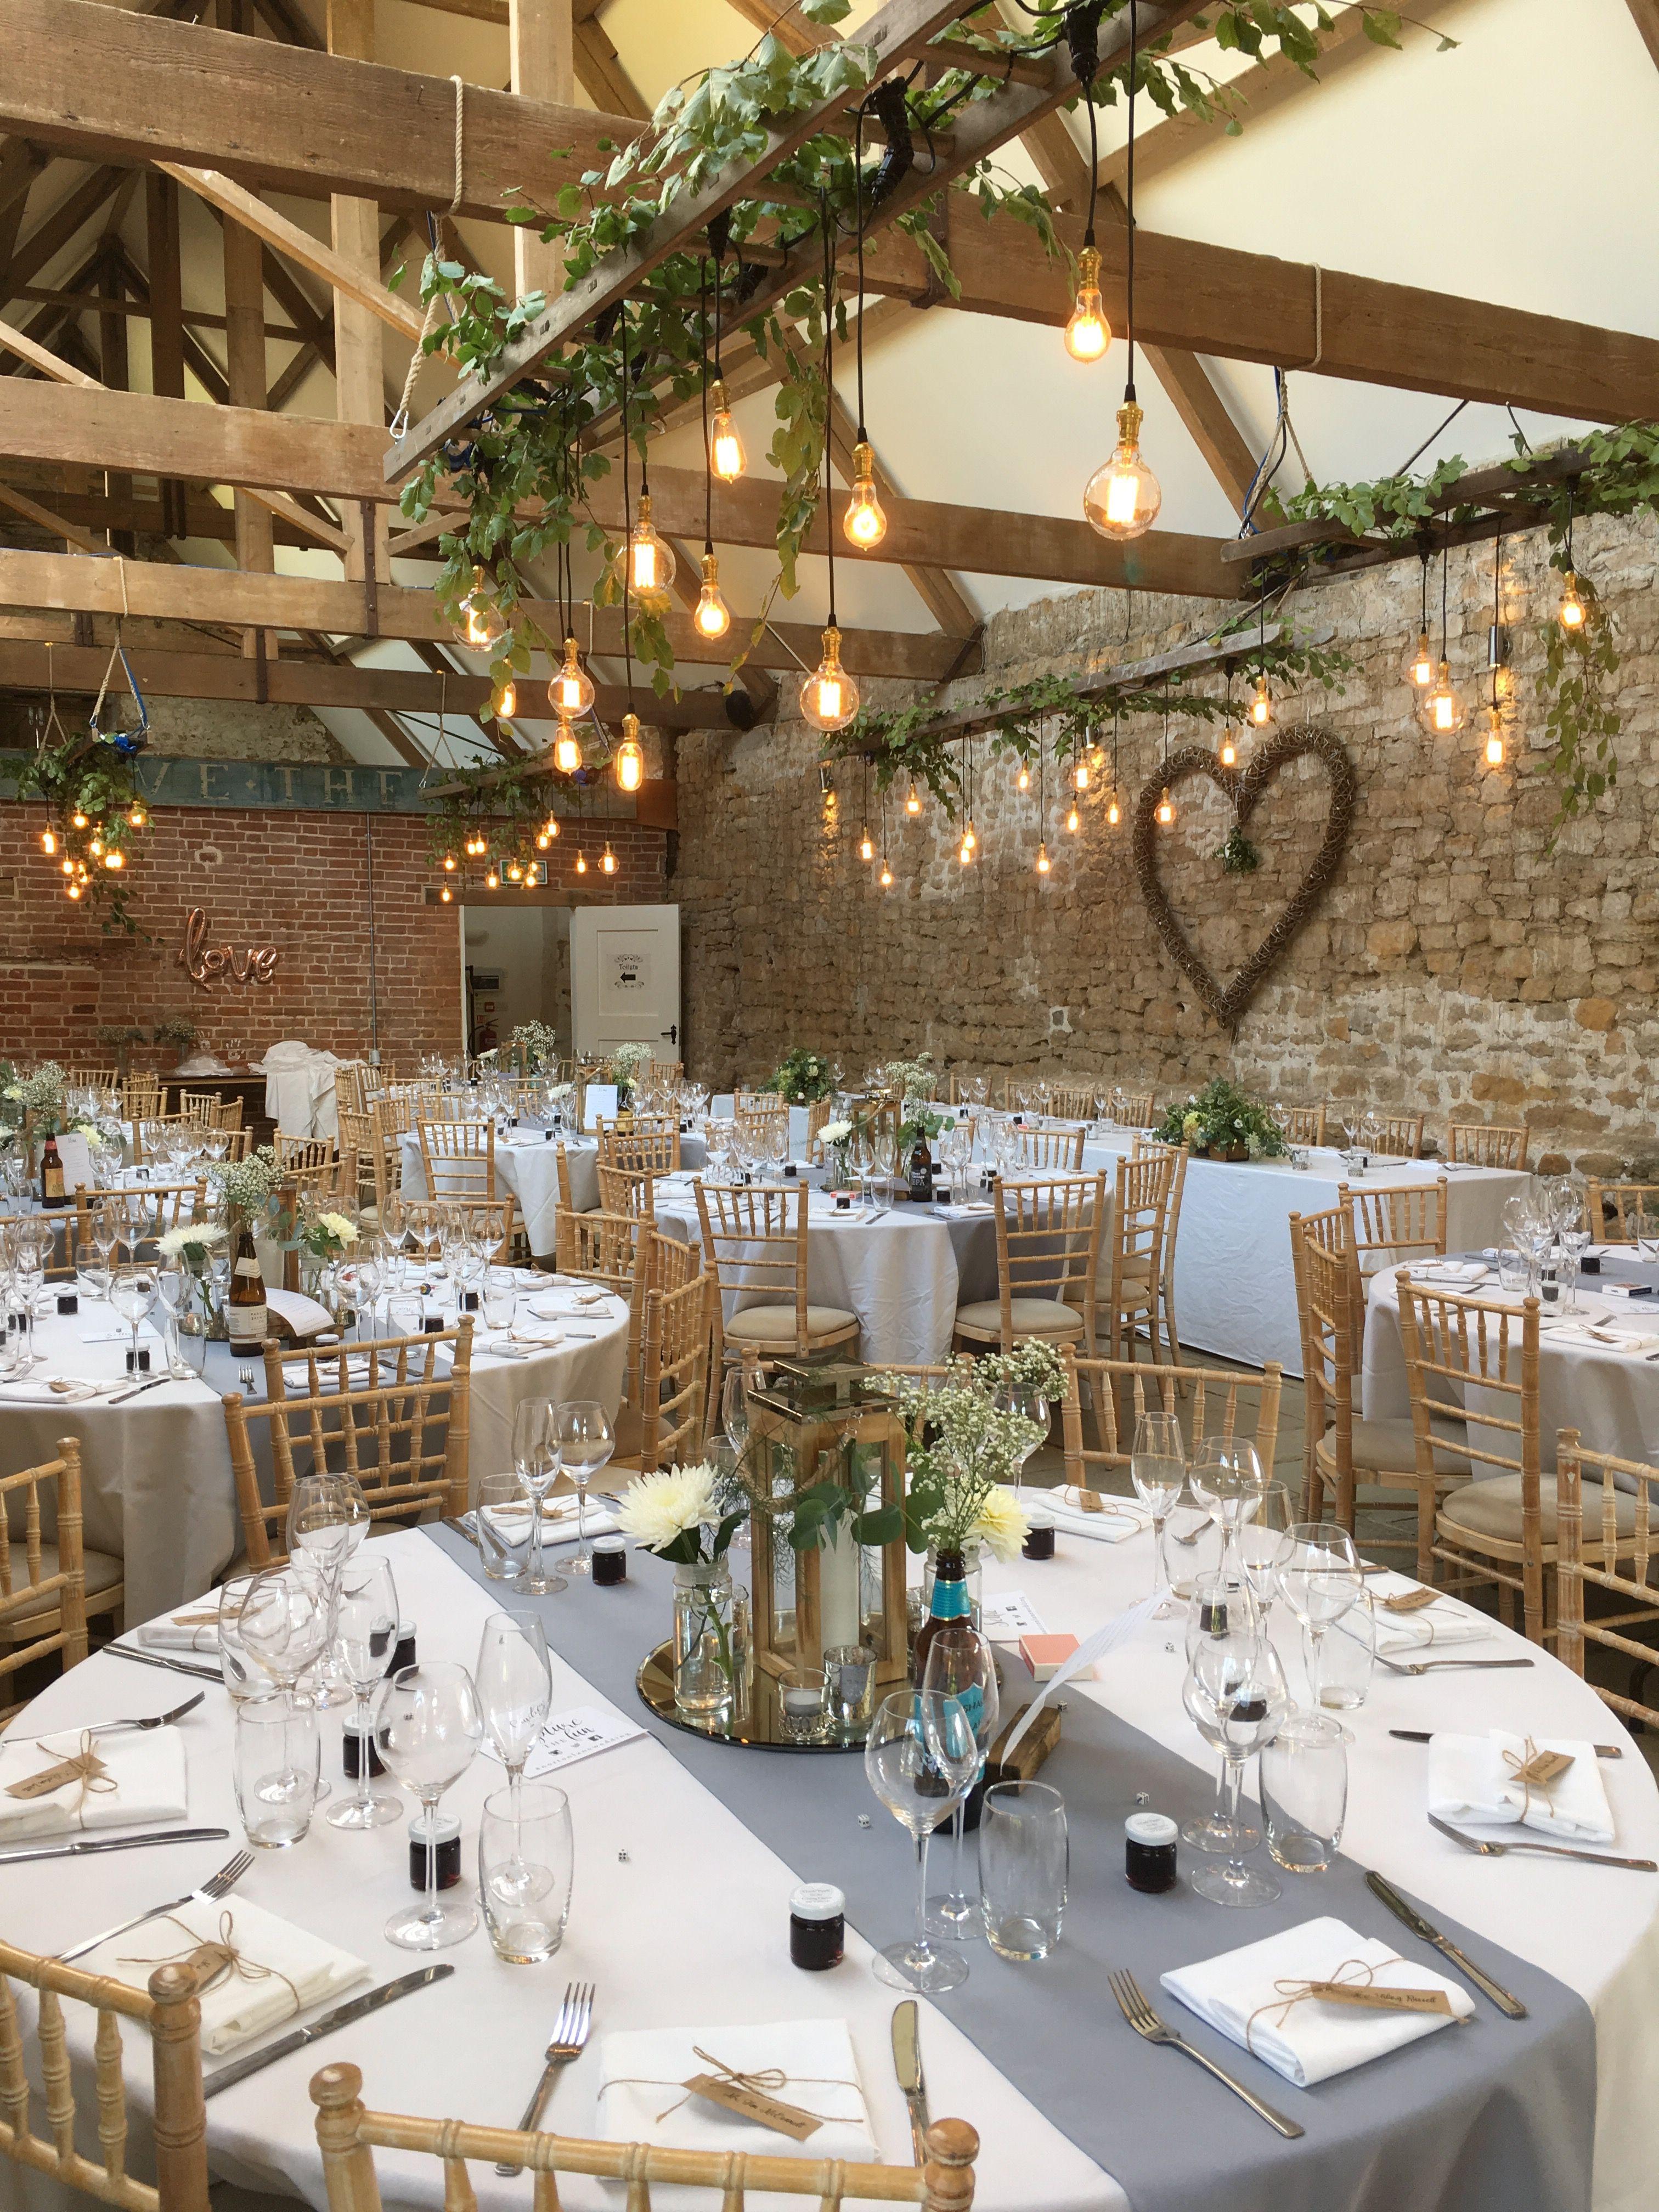 Dorset Wedding Venue In 2020 Barn Wedding Decorations Wedding